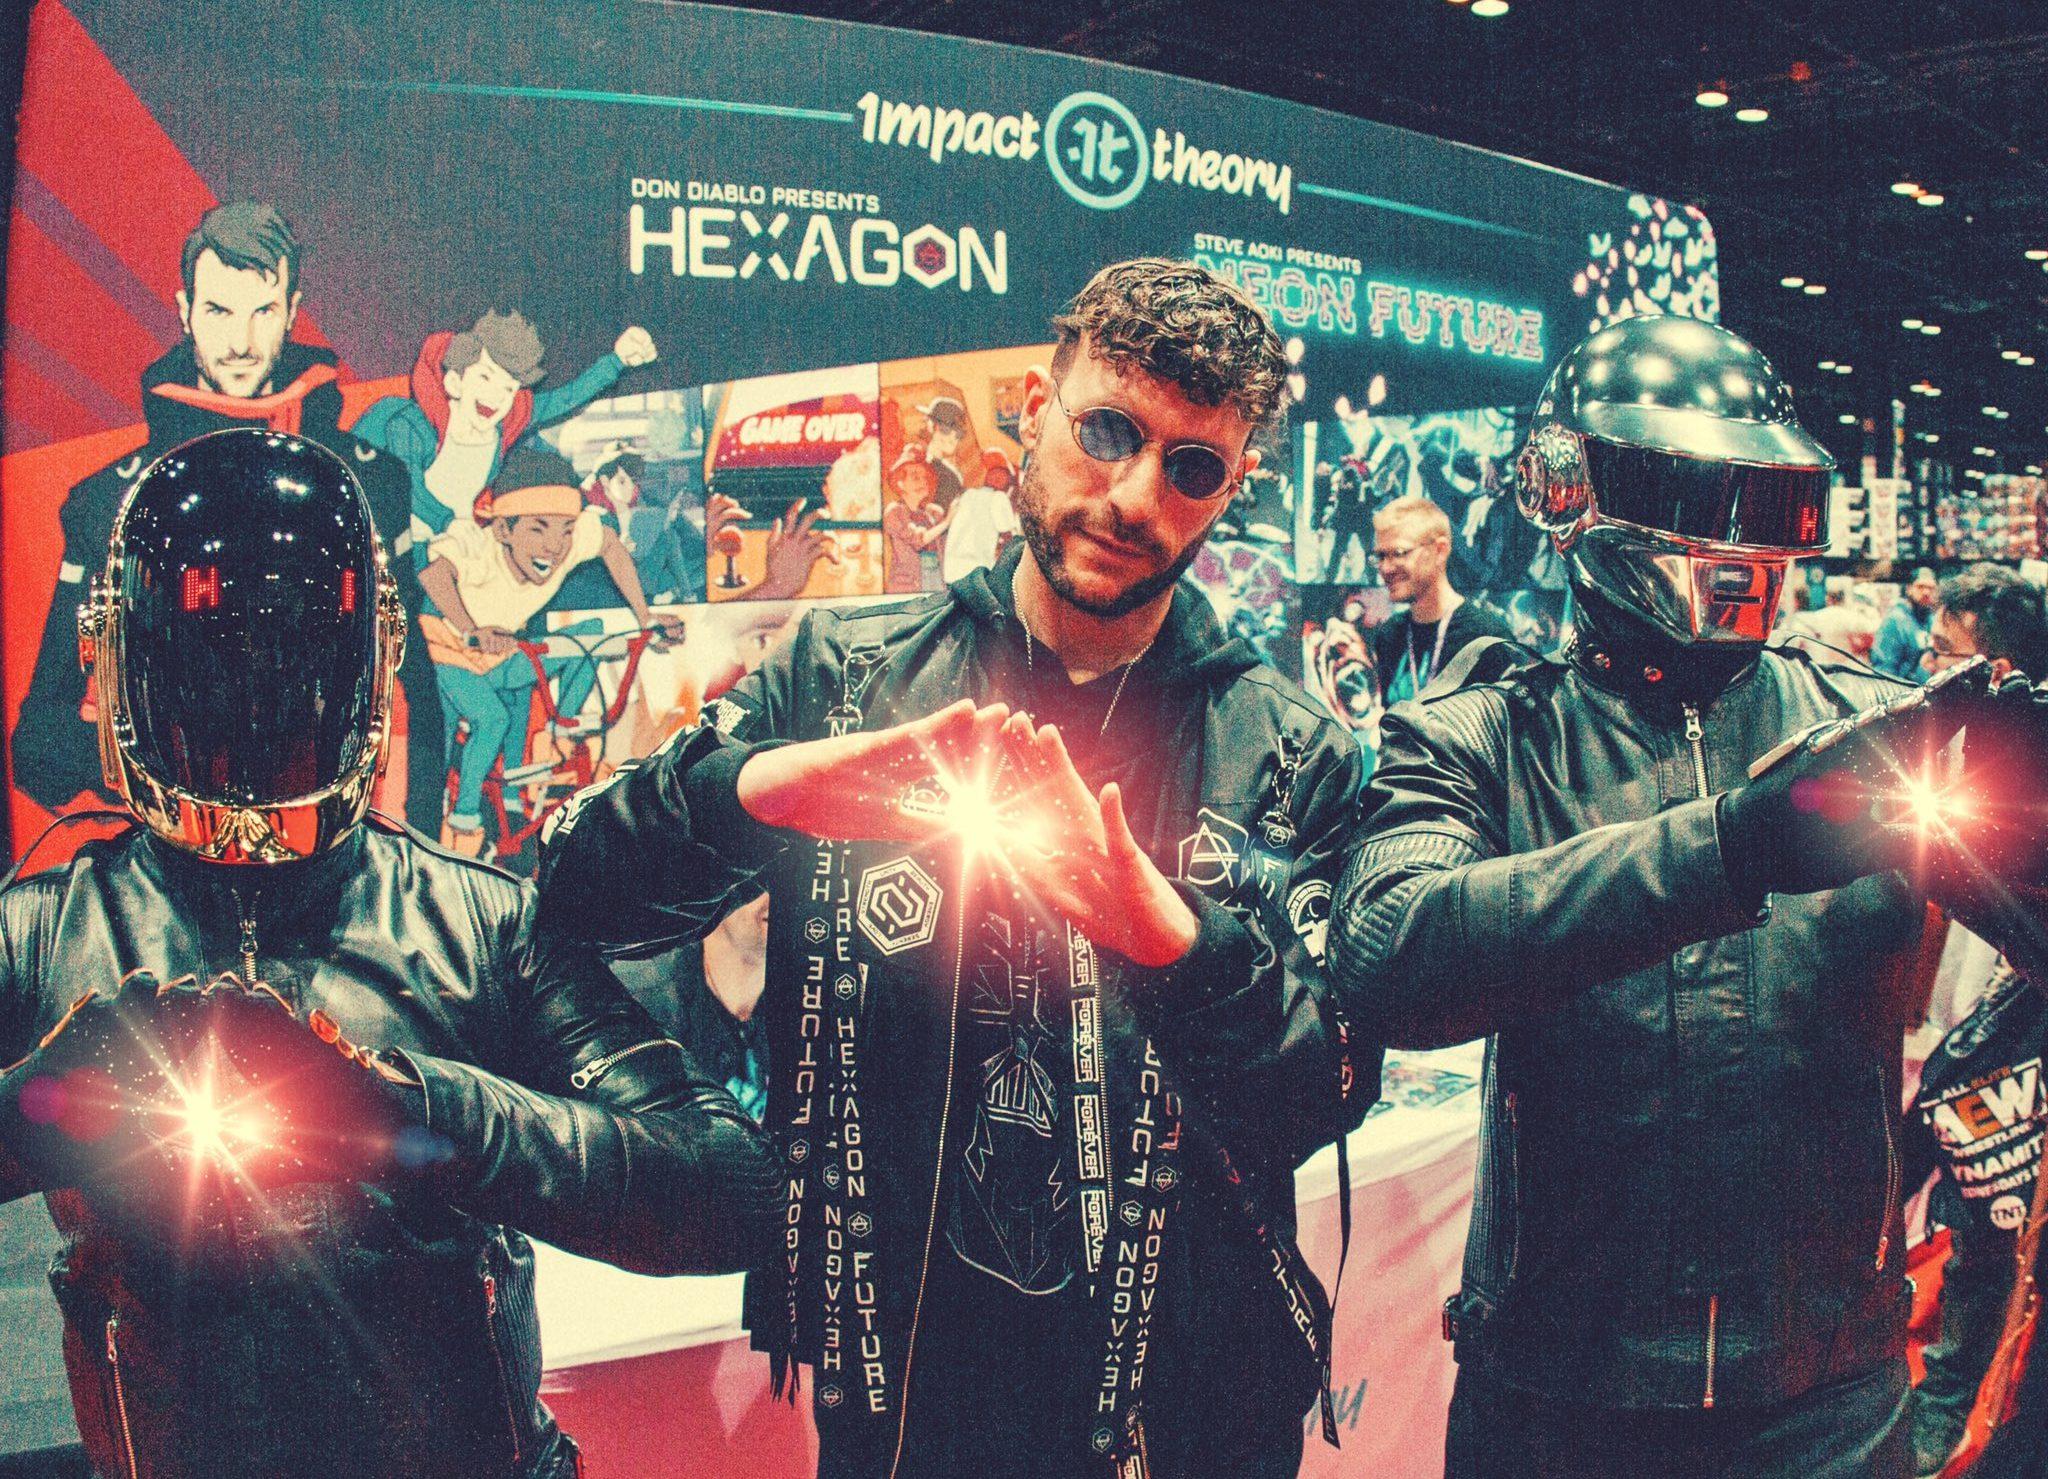 Don DiabloとDaft Punkが共演!?SFコミックシリーズ『HEXAGON』もついに発売決定!